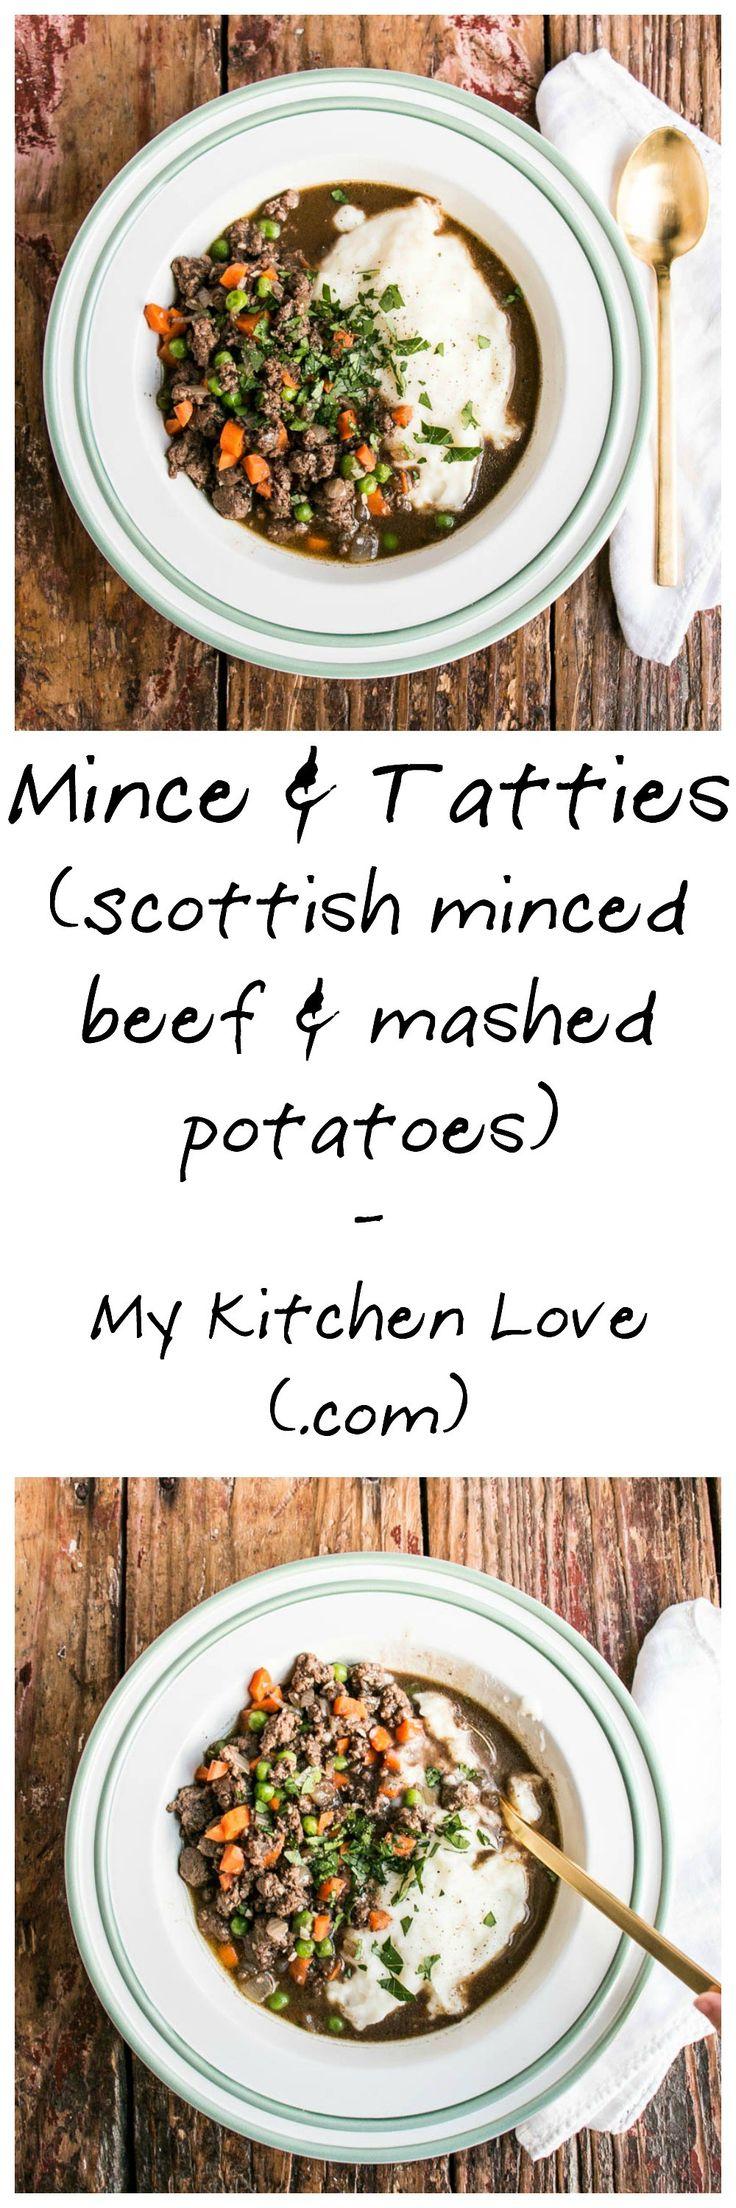 Scottish Mince and Tatties | My Kitchen Love